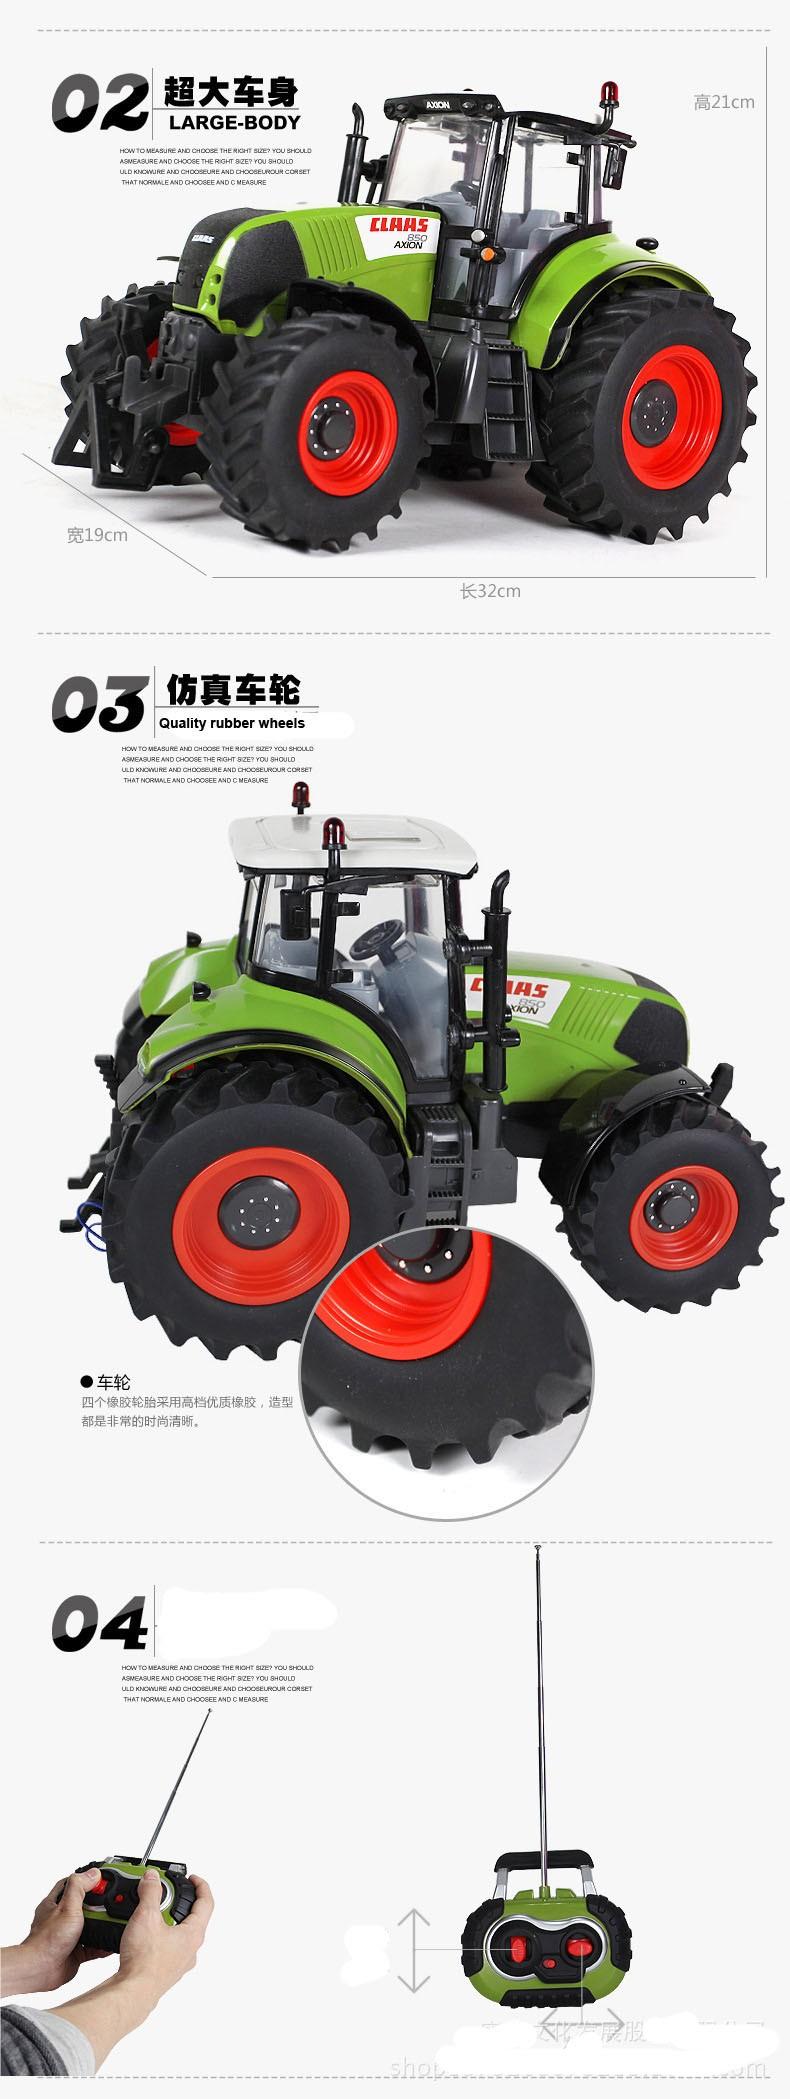 Hot Sale Voiture Telecommande Carrinho De Controle Remoto 1:16 Oversized Radio Remote Control Car Farmer Tractor Kids Toy 6